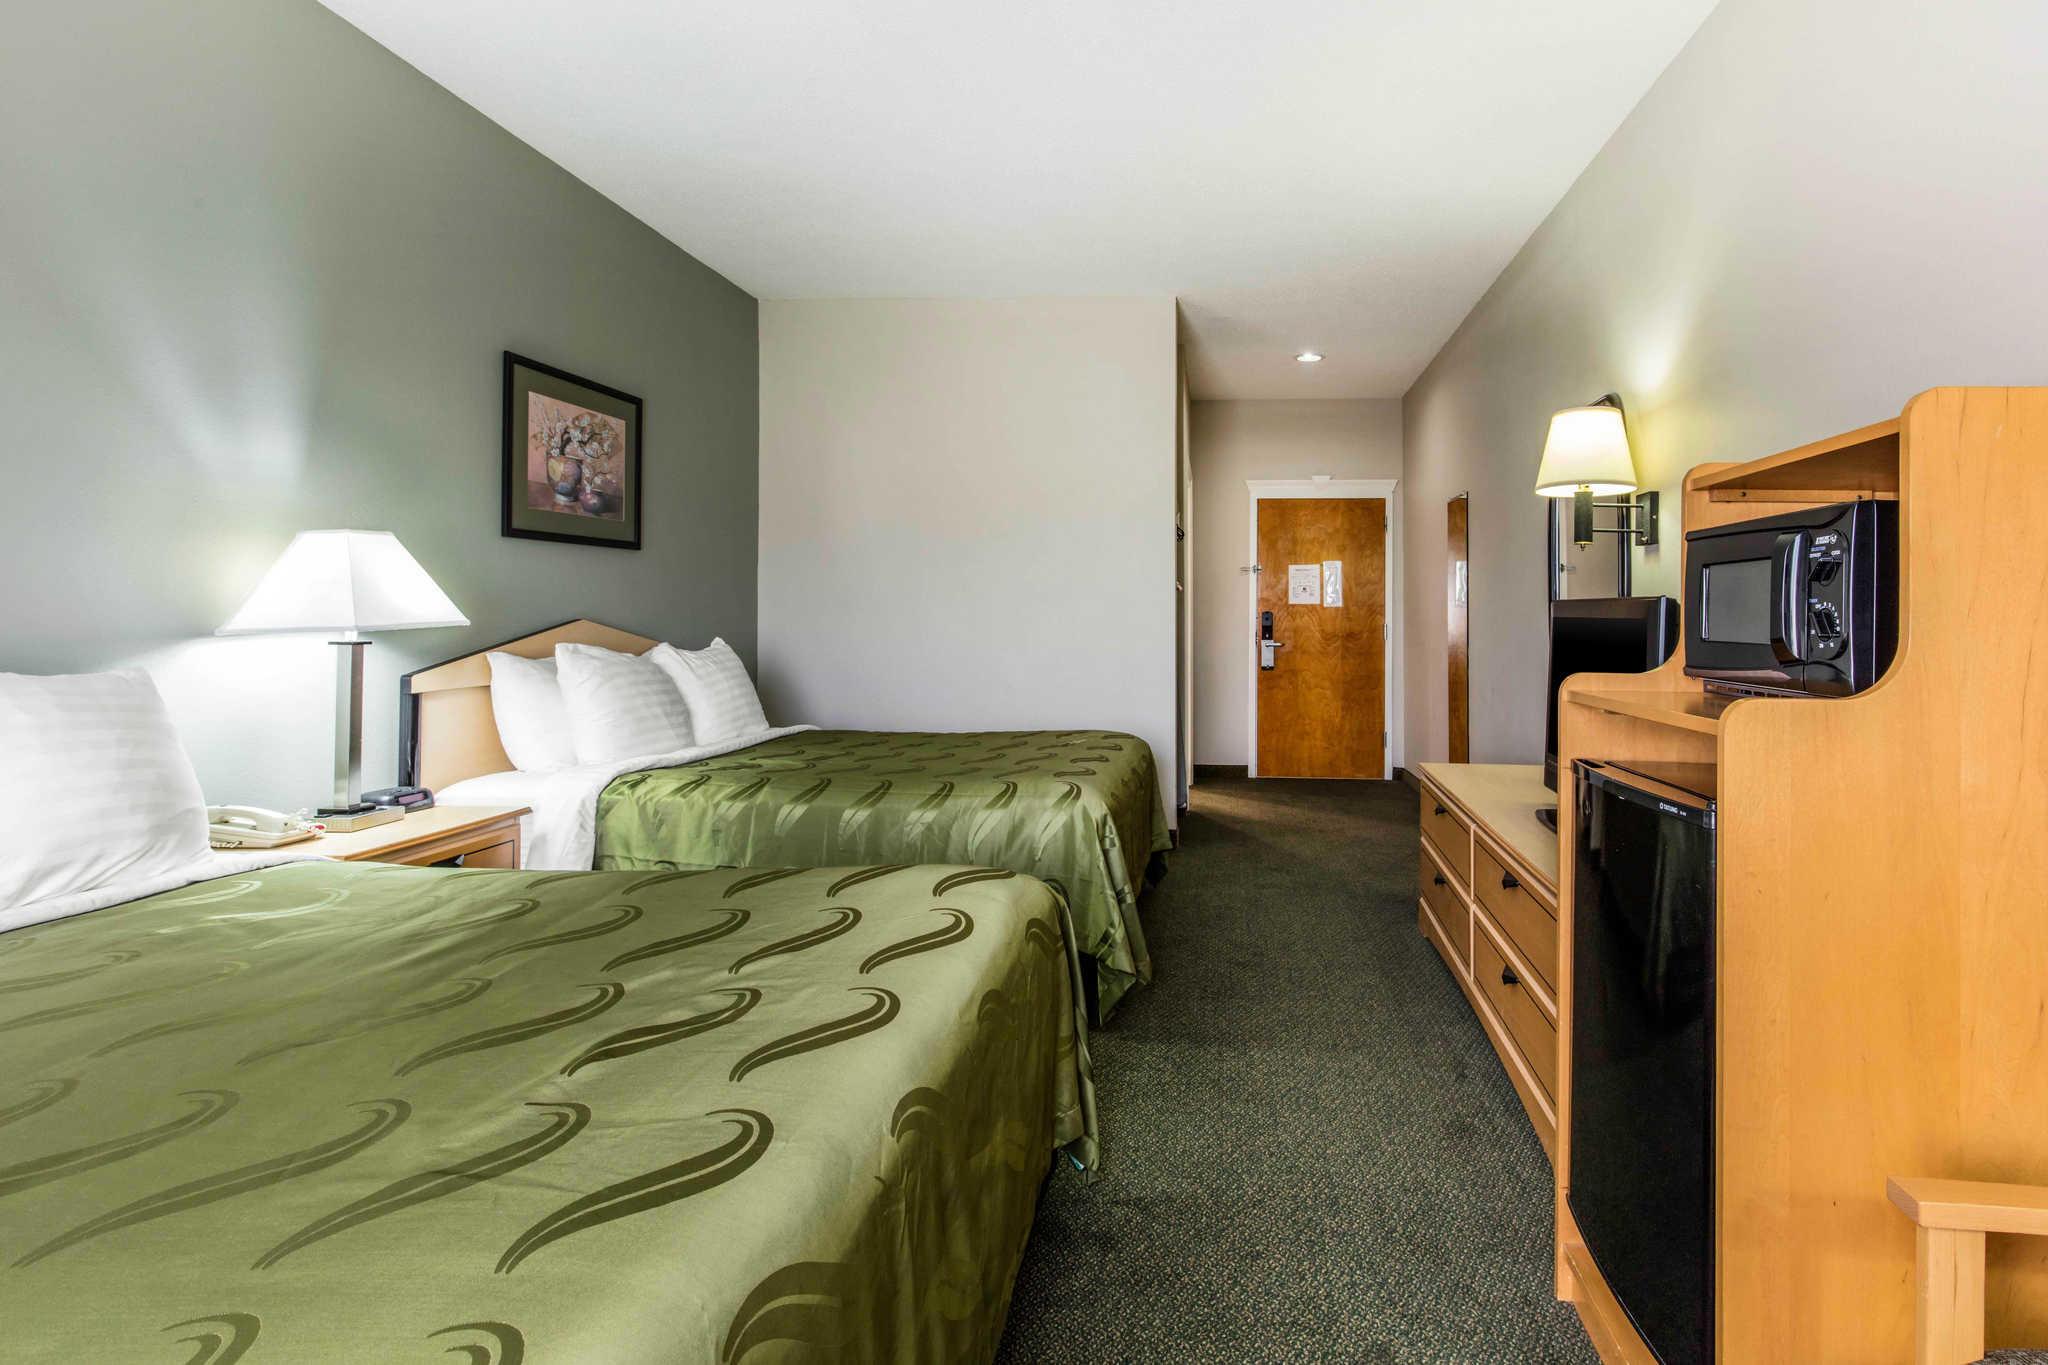 Quality Inn & Suites Jackson Int'l Airport image 14